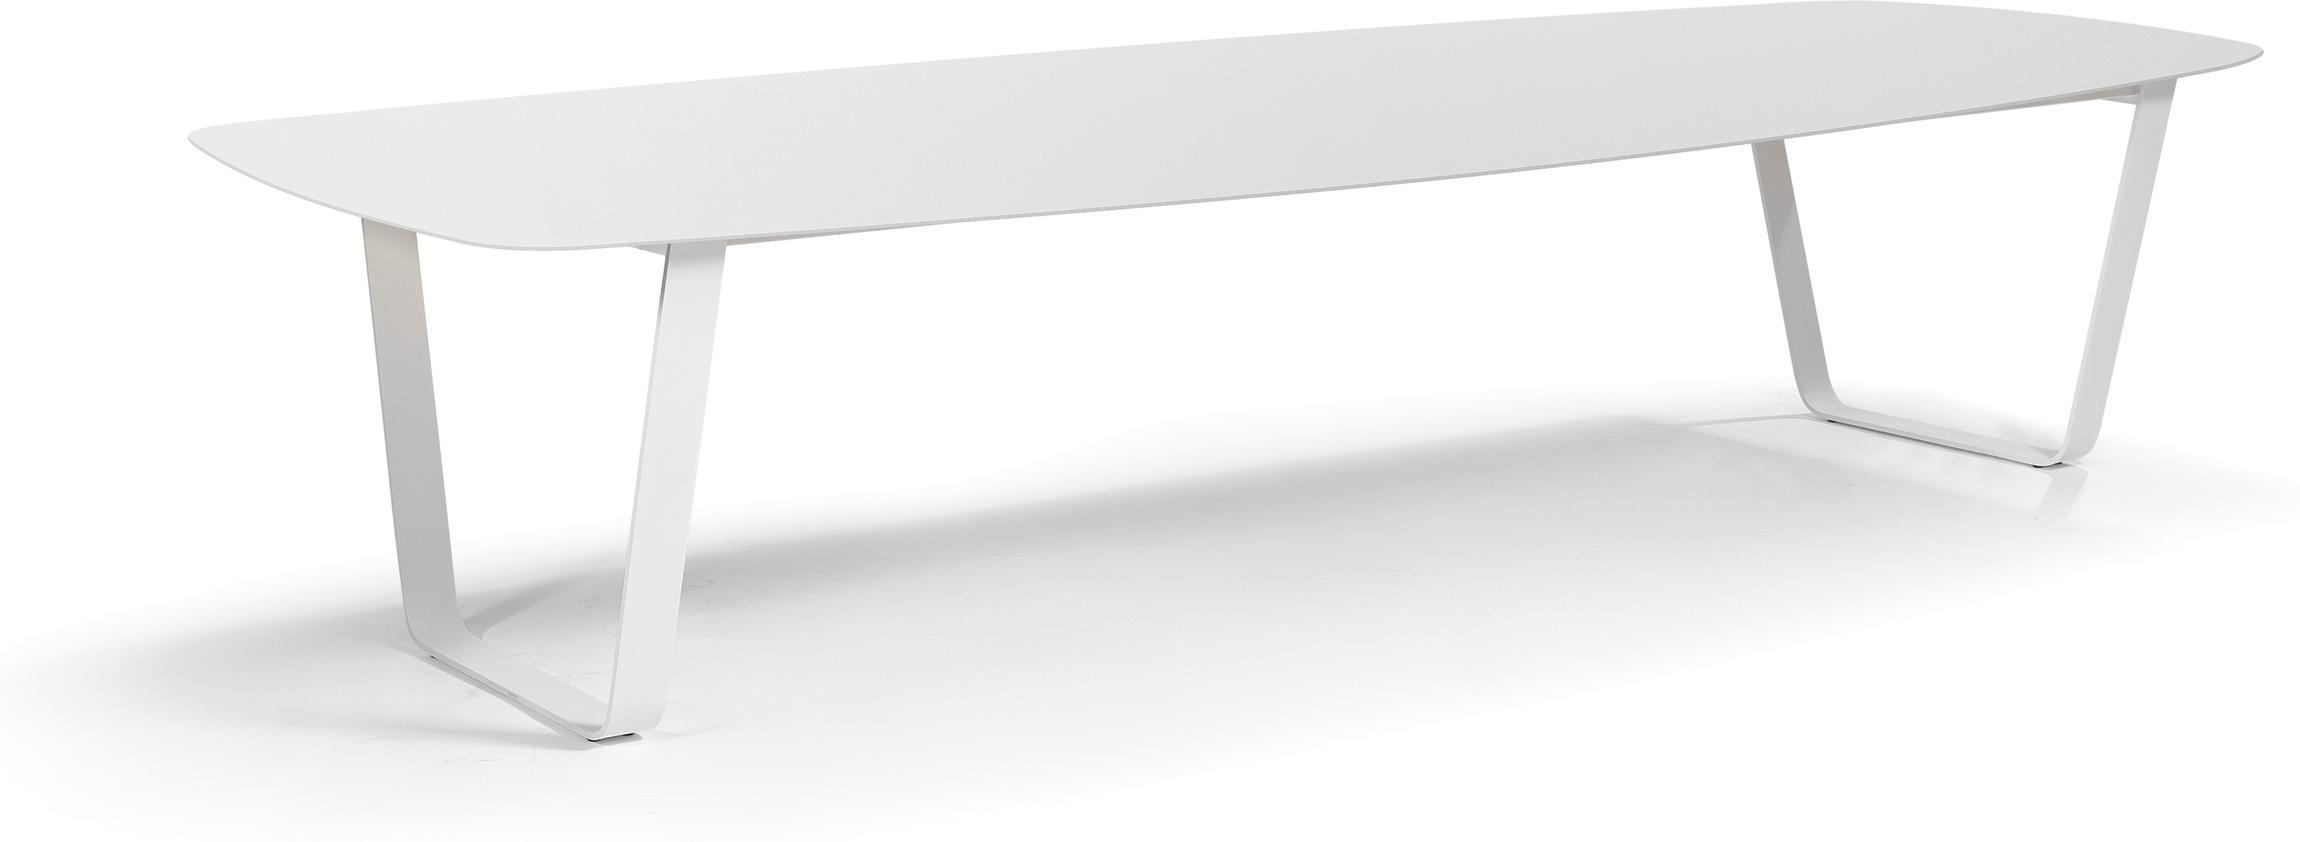 Air Mesa de comedor - blanco - 340